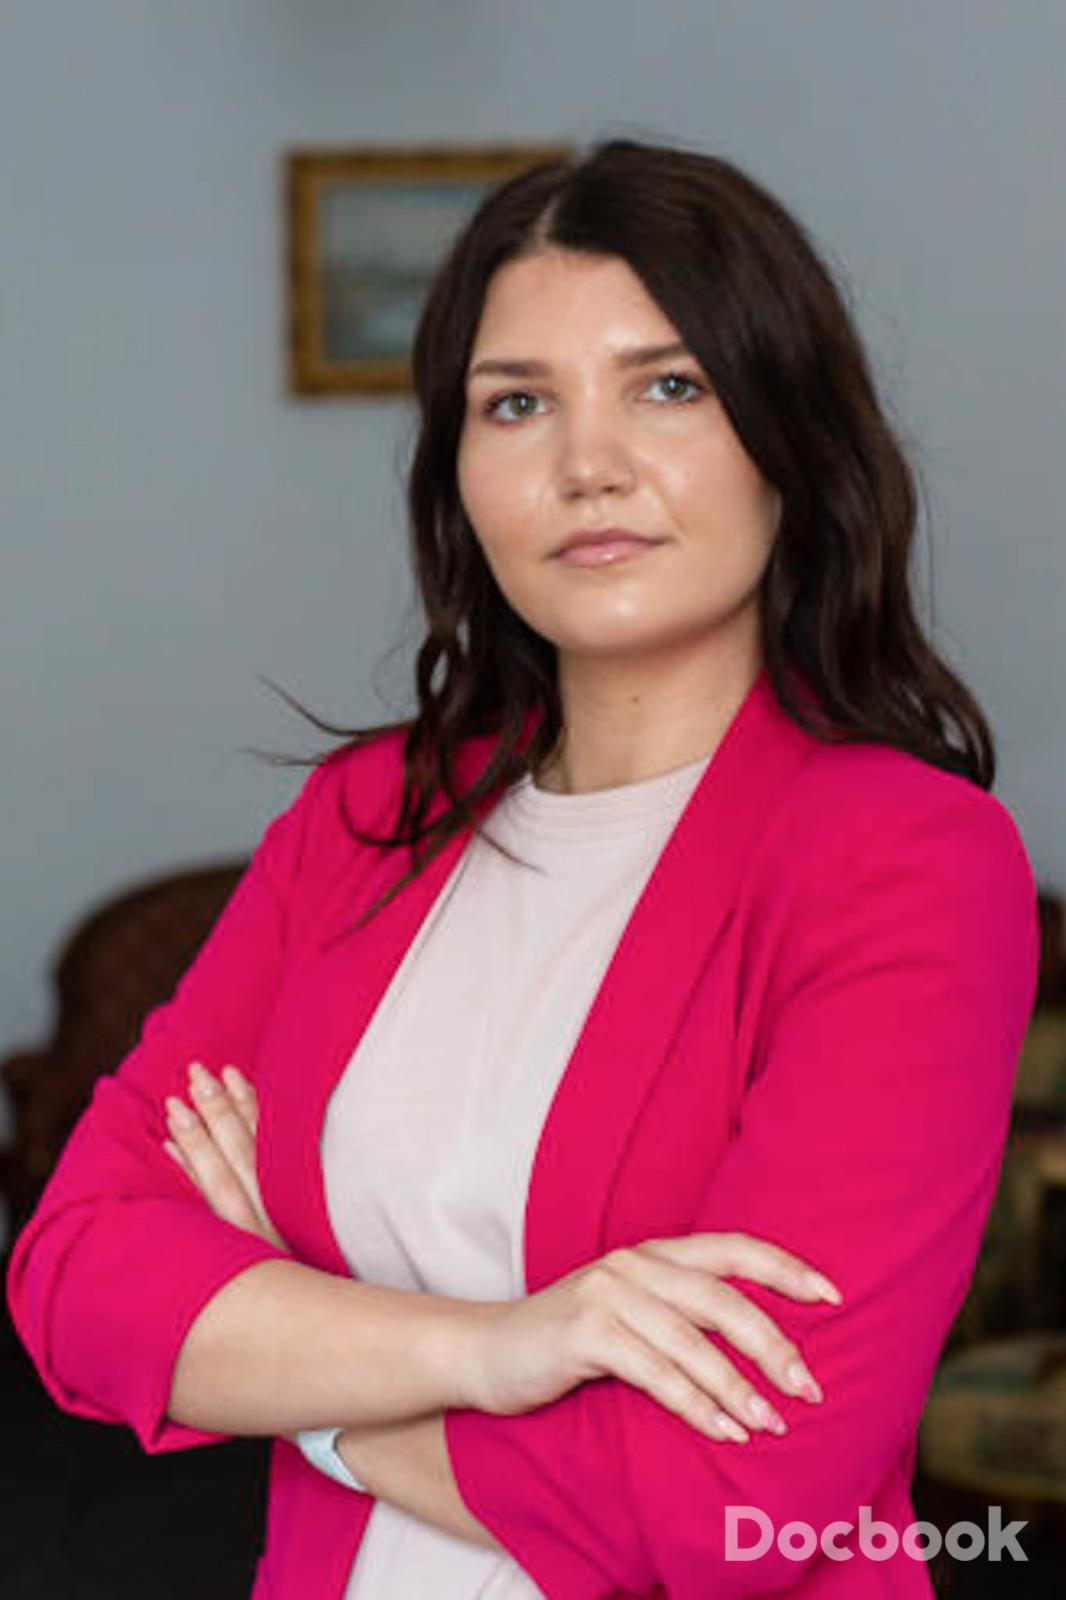 Marta Pavel